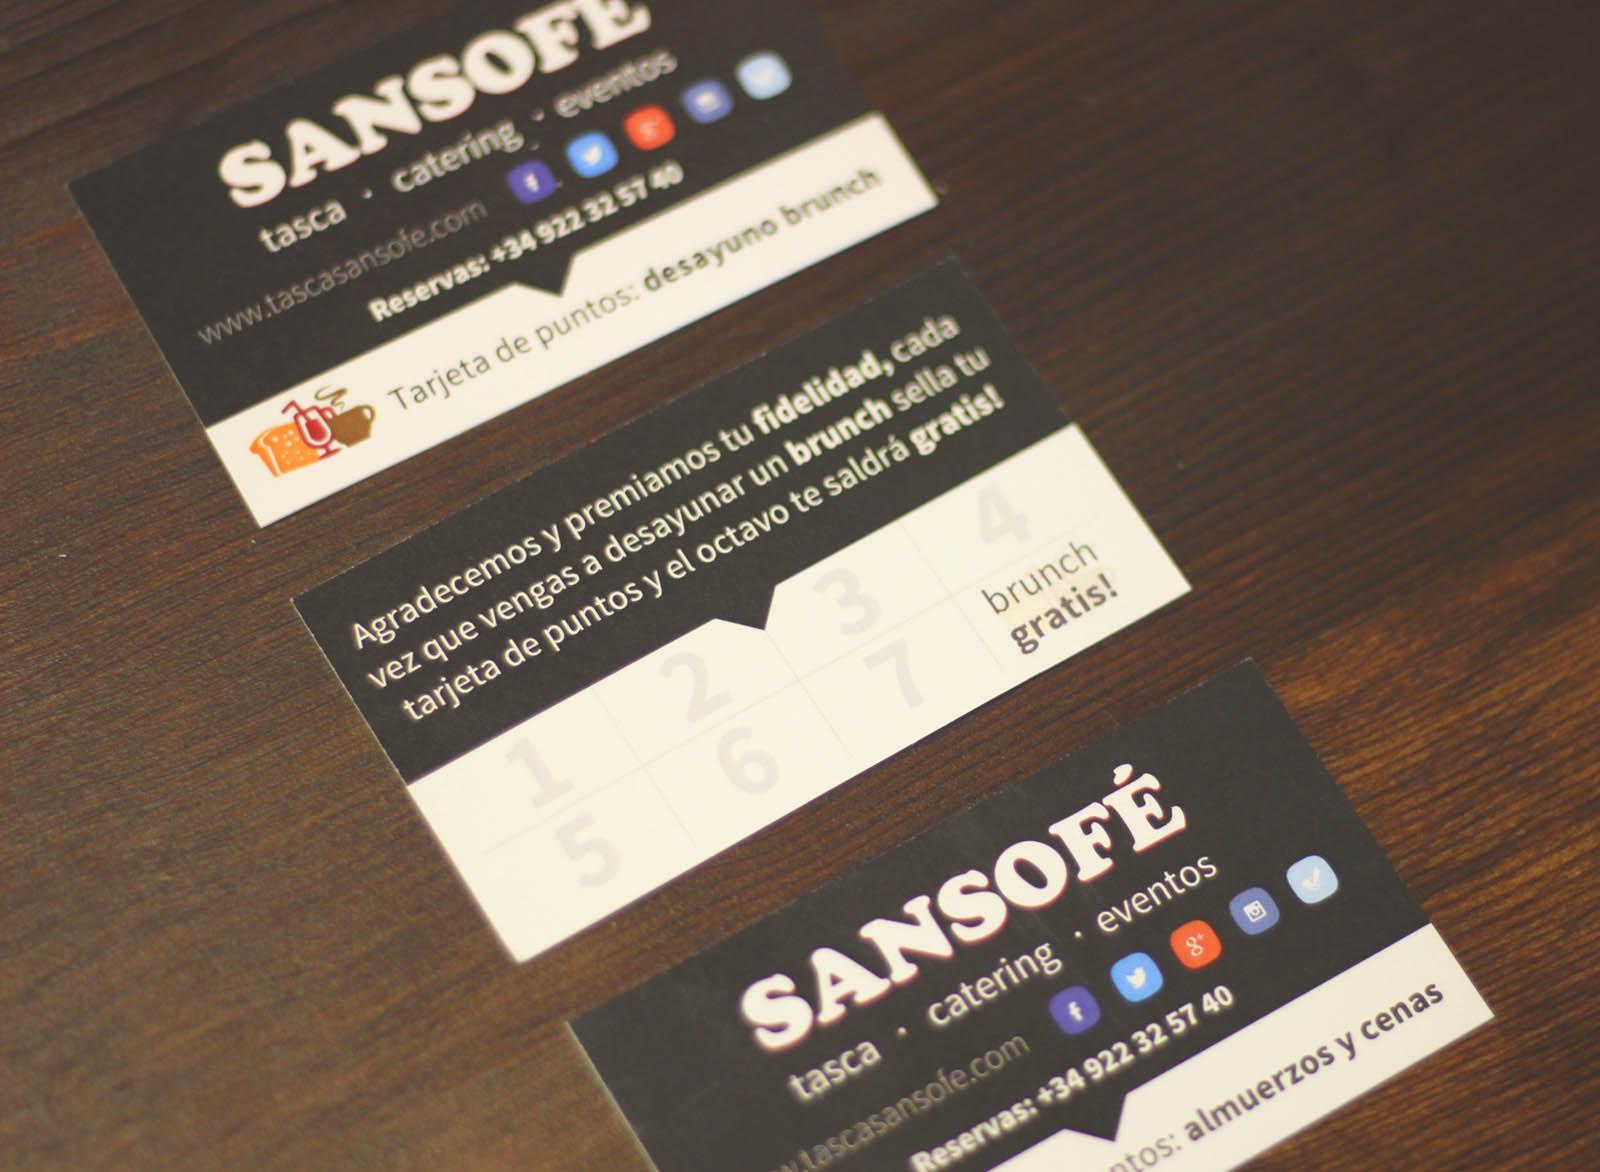 Tasca Sansofé tarjetas de fidelización para comer